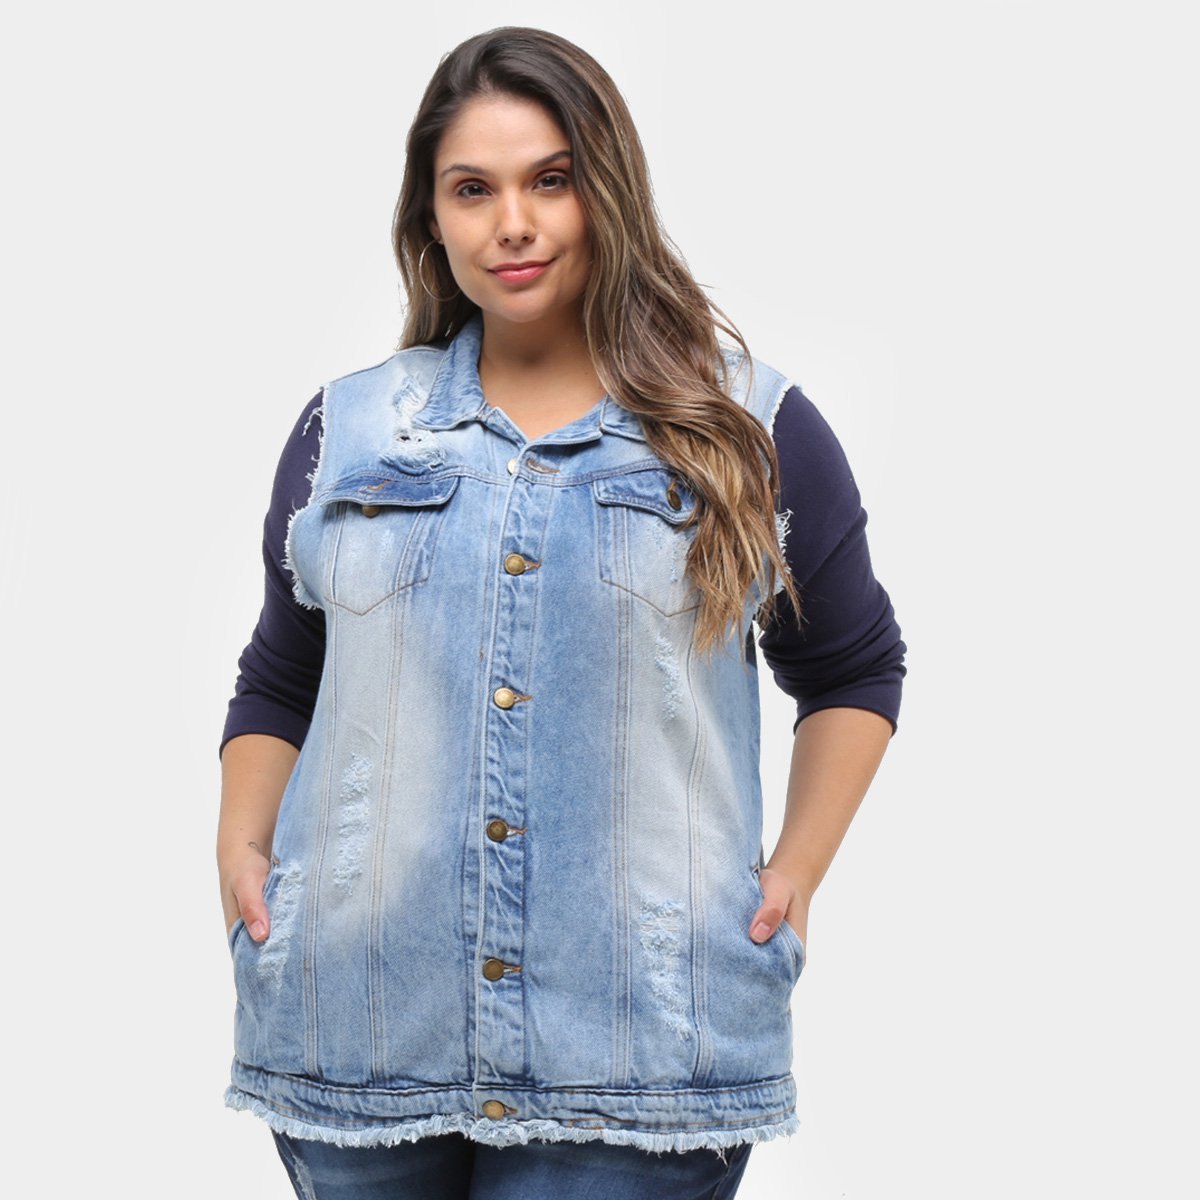 Colete Jeans Xtra Charmy Max Plus Size Feminino